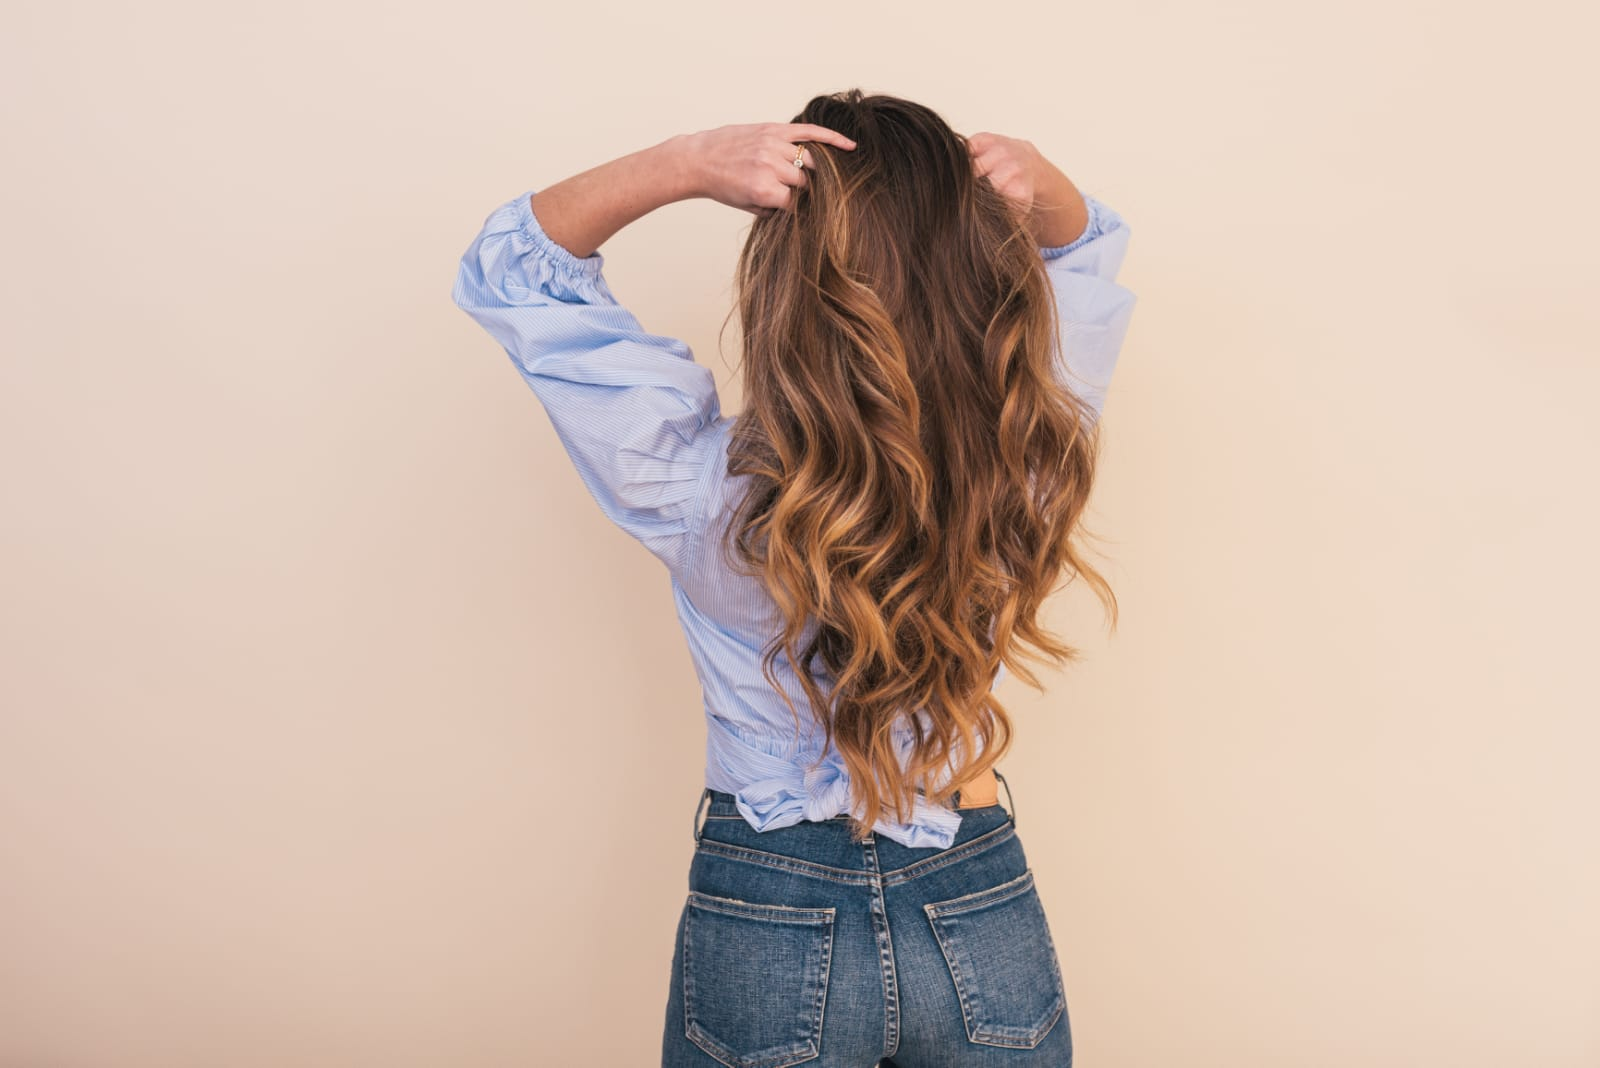 Melír+toner+foukaná - dlouhé vlasy - 2300 Kč